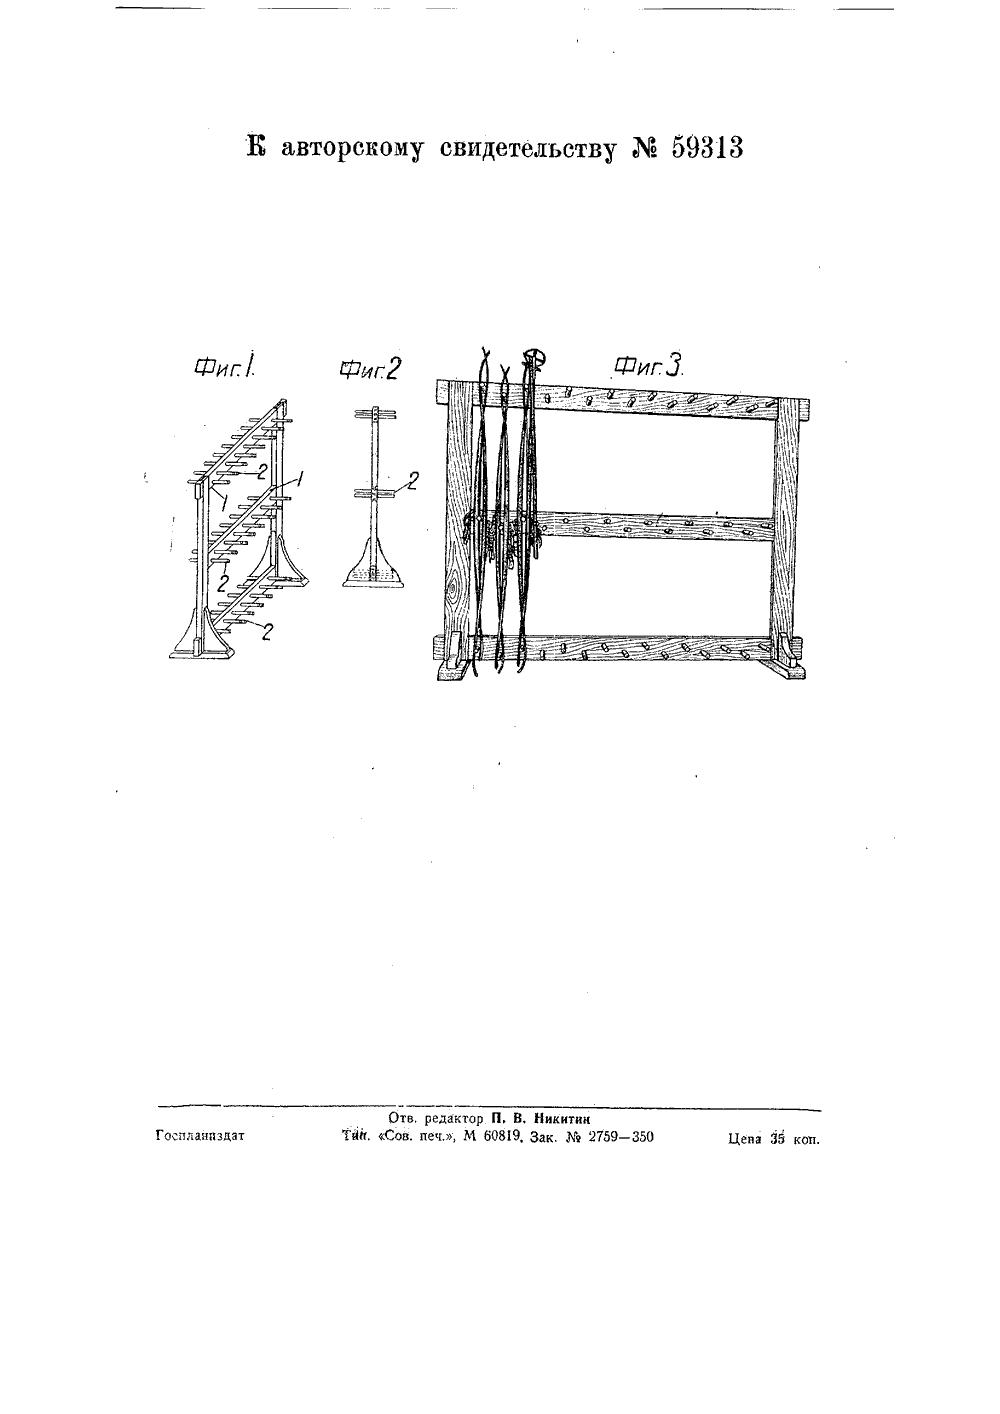 Пирамида (стойка) для хранения лыж - Патент СССР 01.01.1941 - SU 59313 База патентов СССР